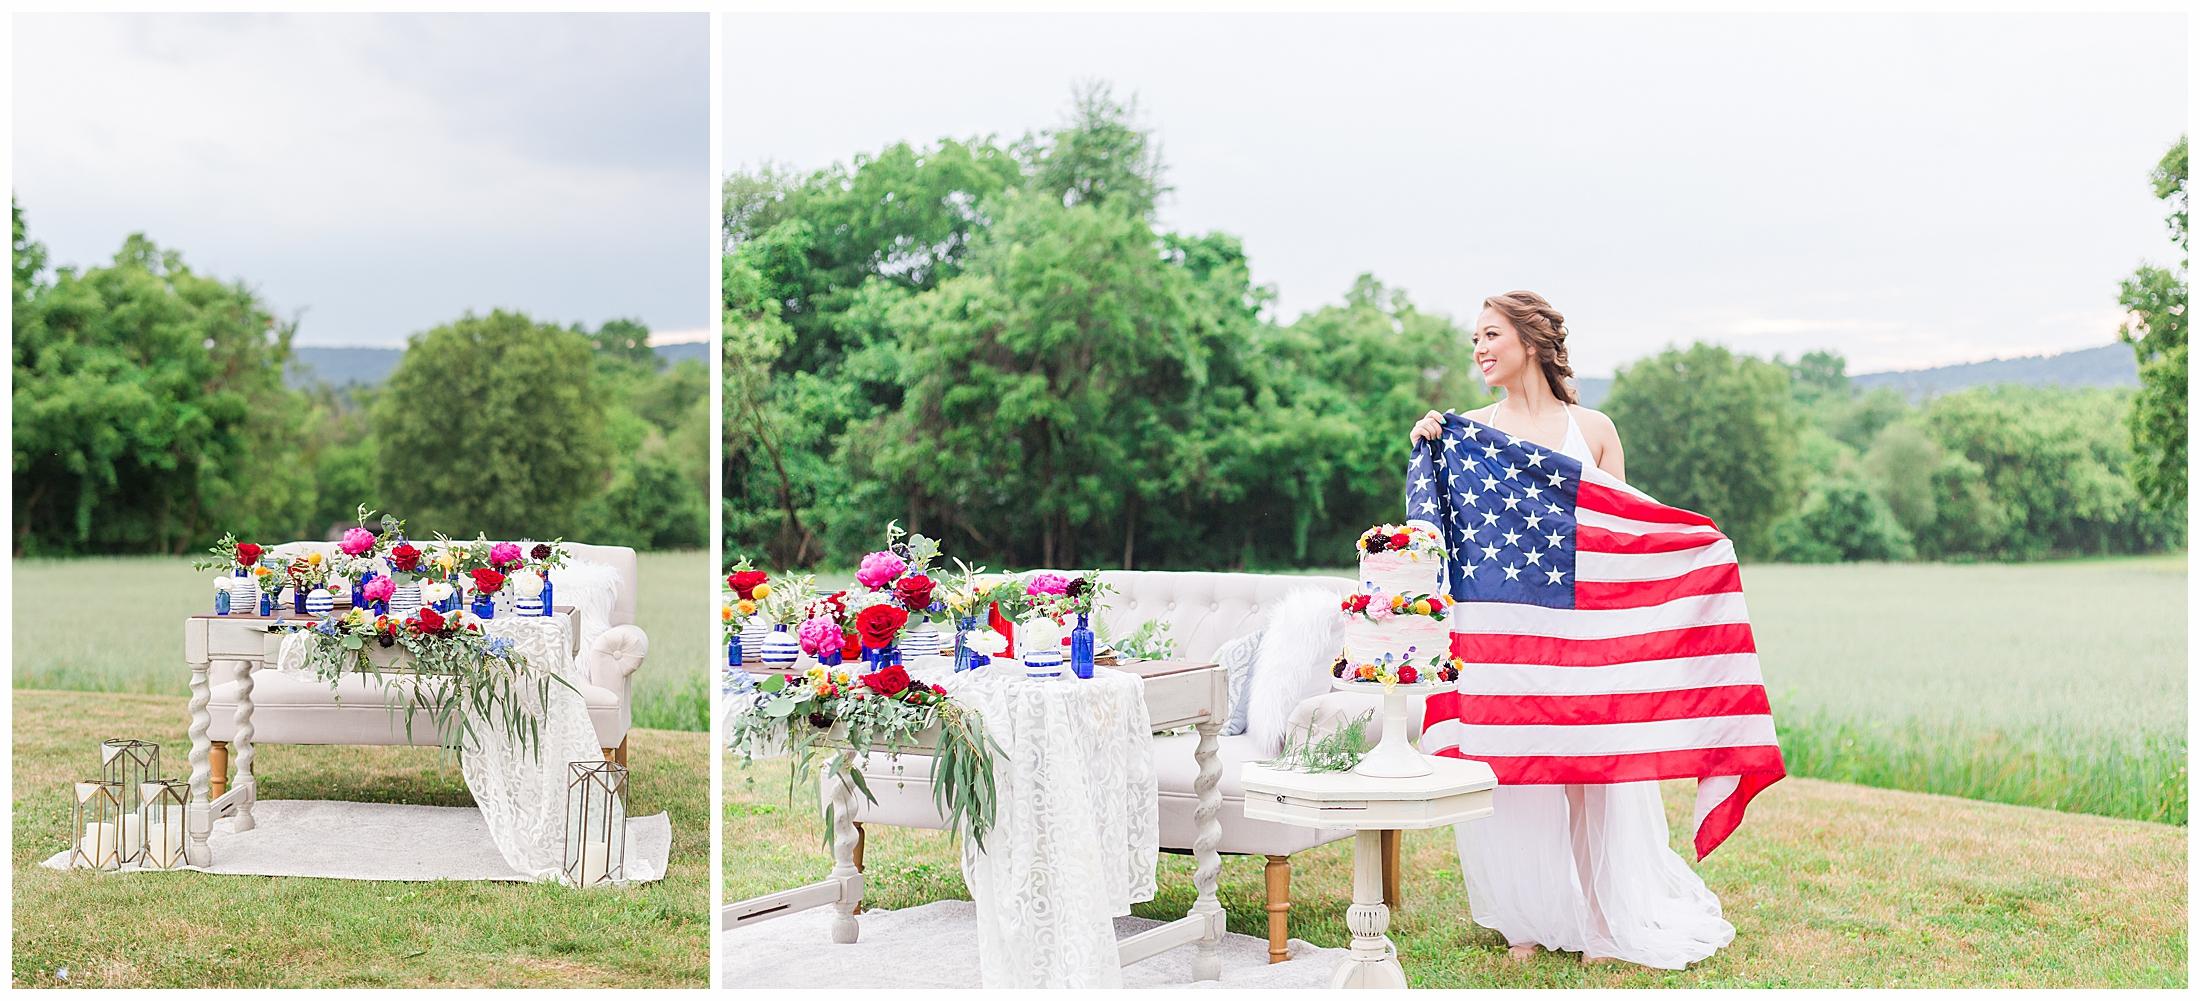 colorful-americana-wedding-shoot_0059.jpg